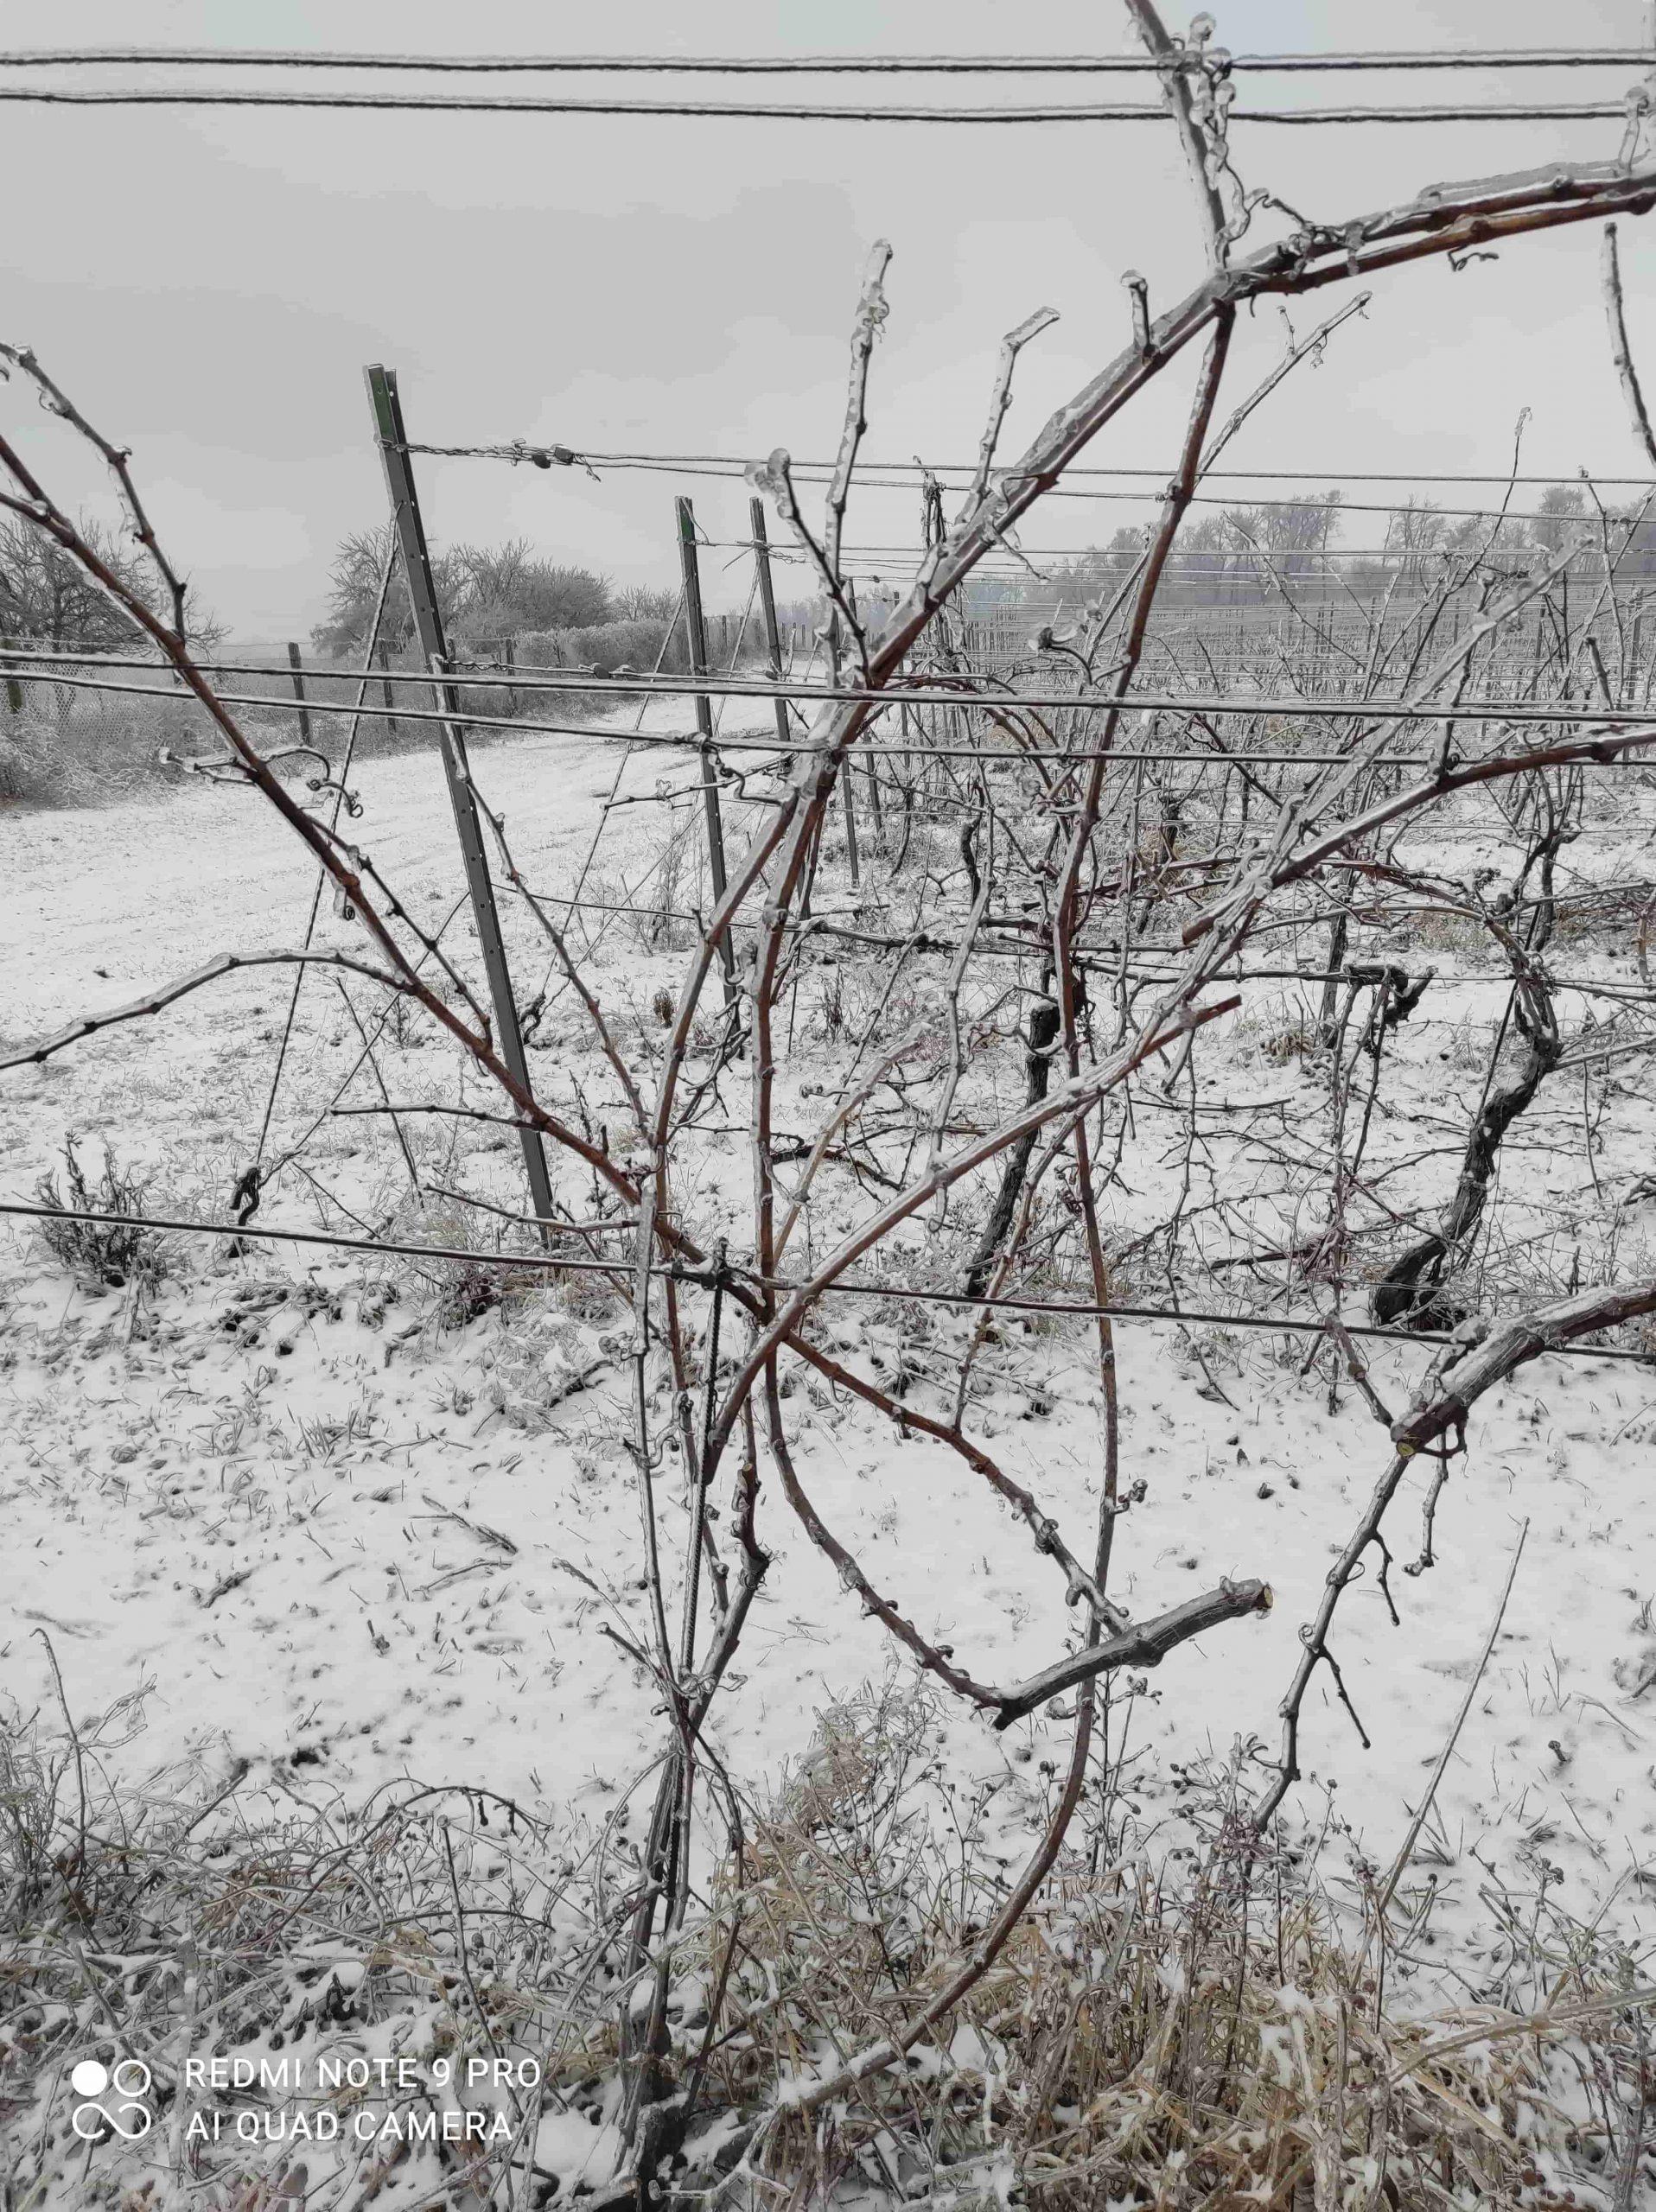 vinohrad12_Vinarstvo Kopecek-min